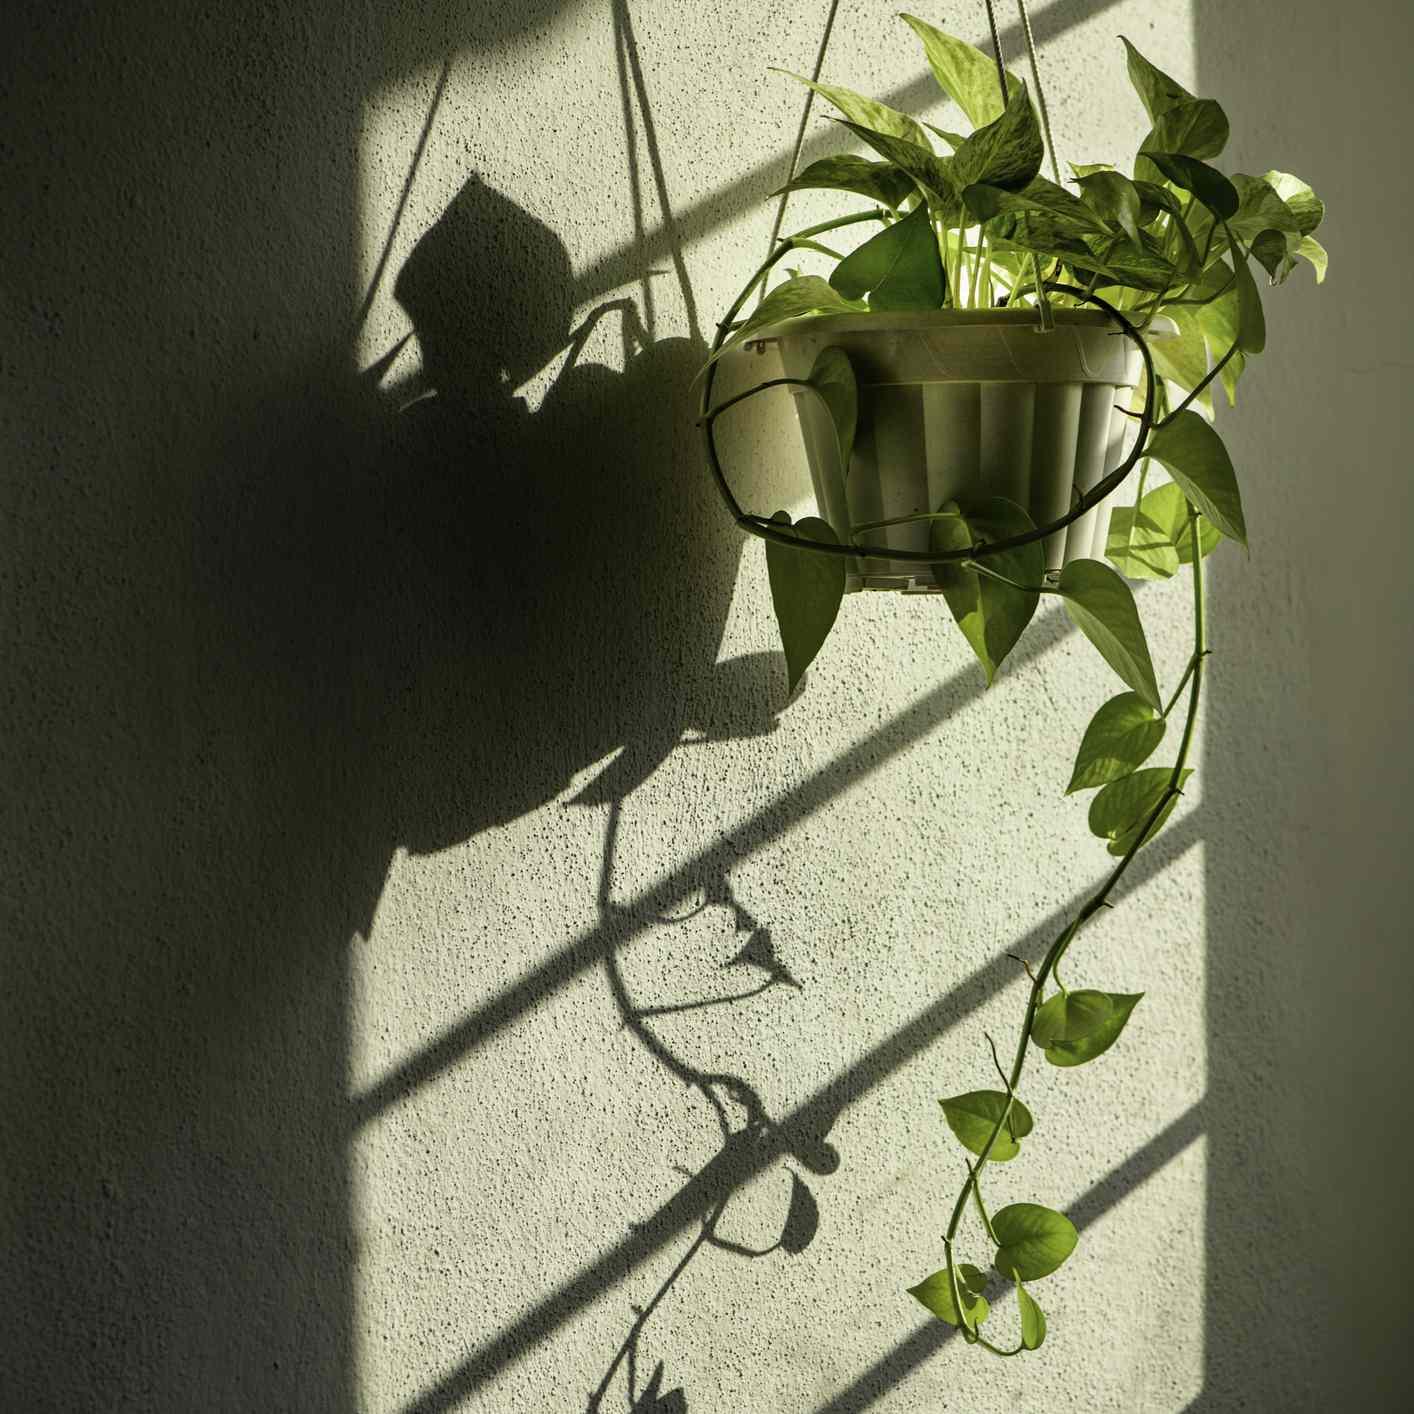 hanging pothos plant in a dark room